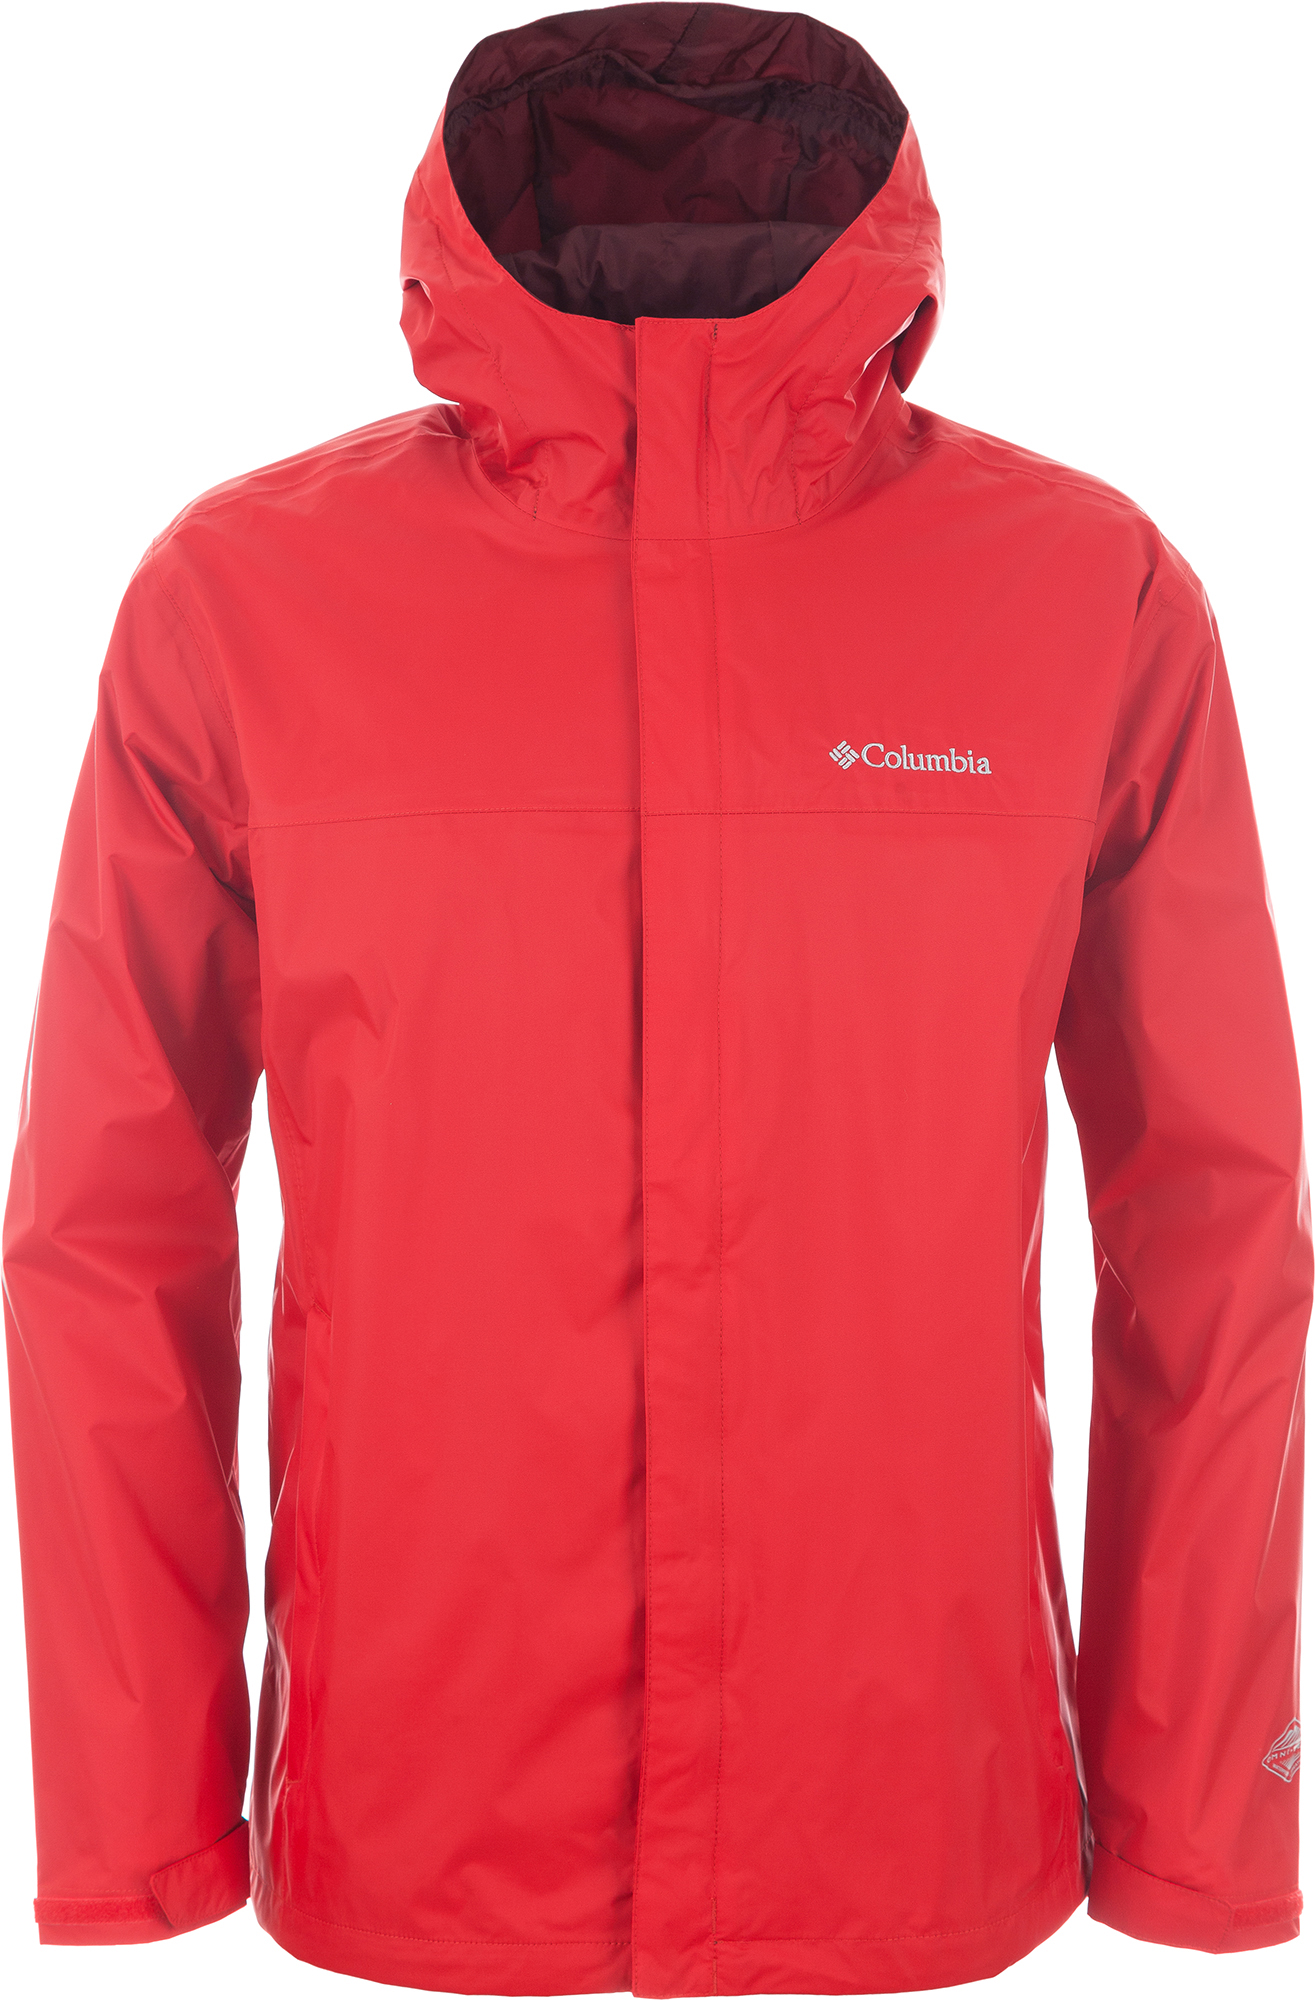 Columbia Ветровка мужская Columbia Watertight II Jacket